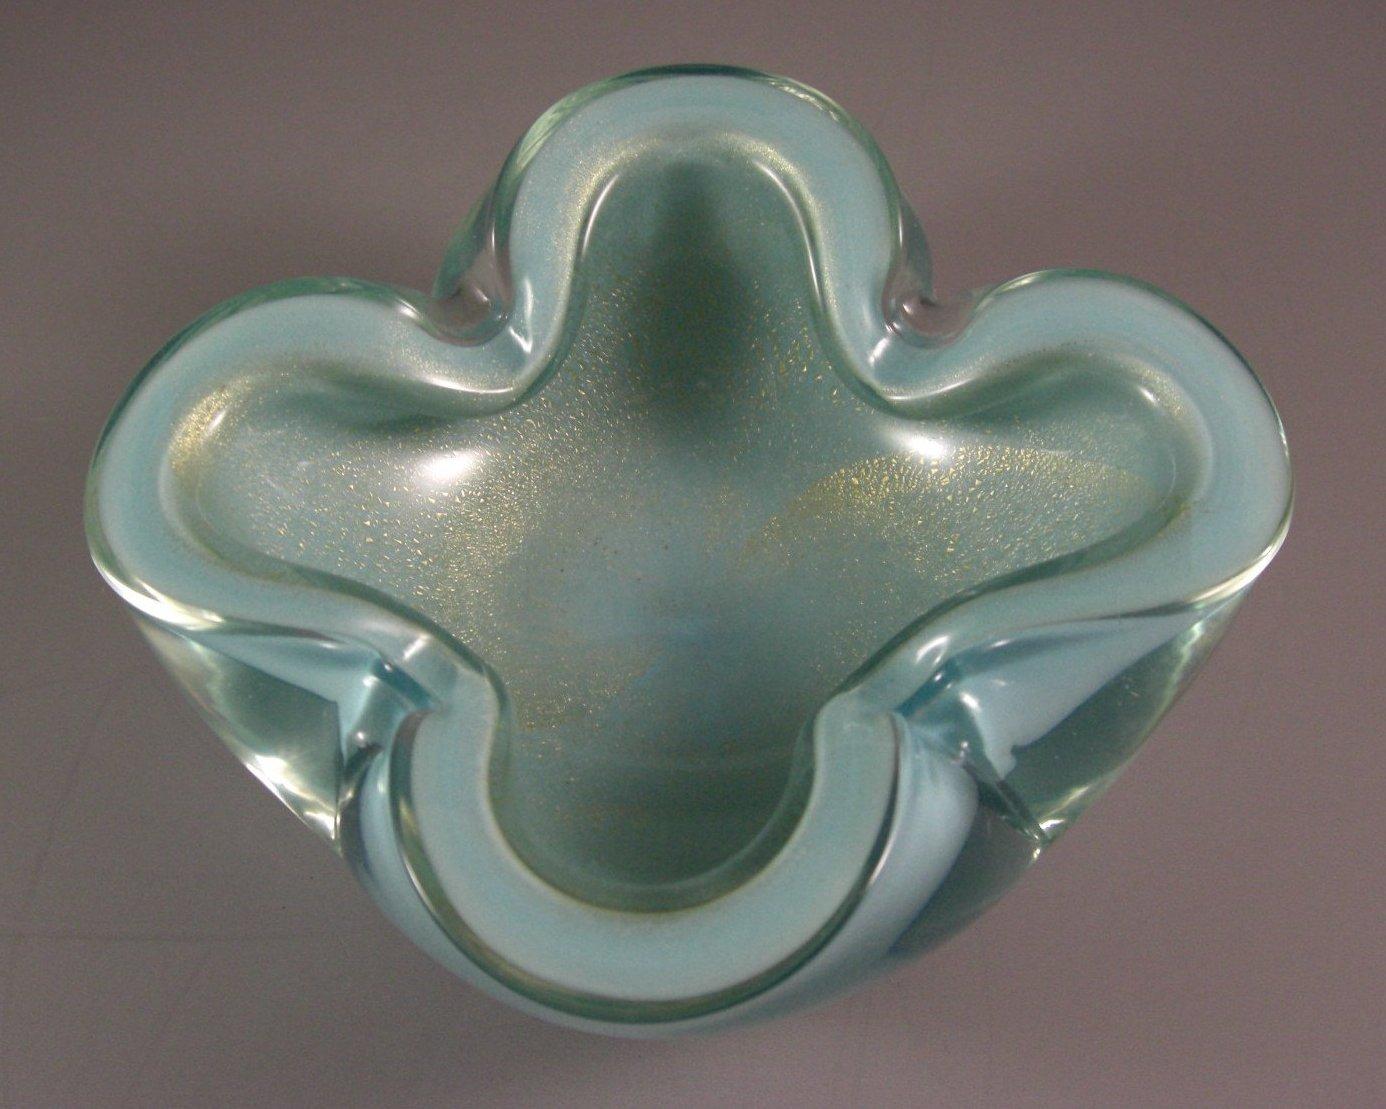 Mid-Century Murano Italian Cased Art Glass Bowl Ashtray // Swirled Gold Dust Ave